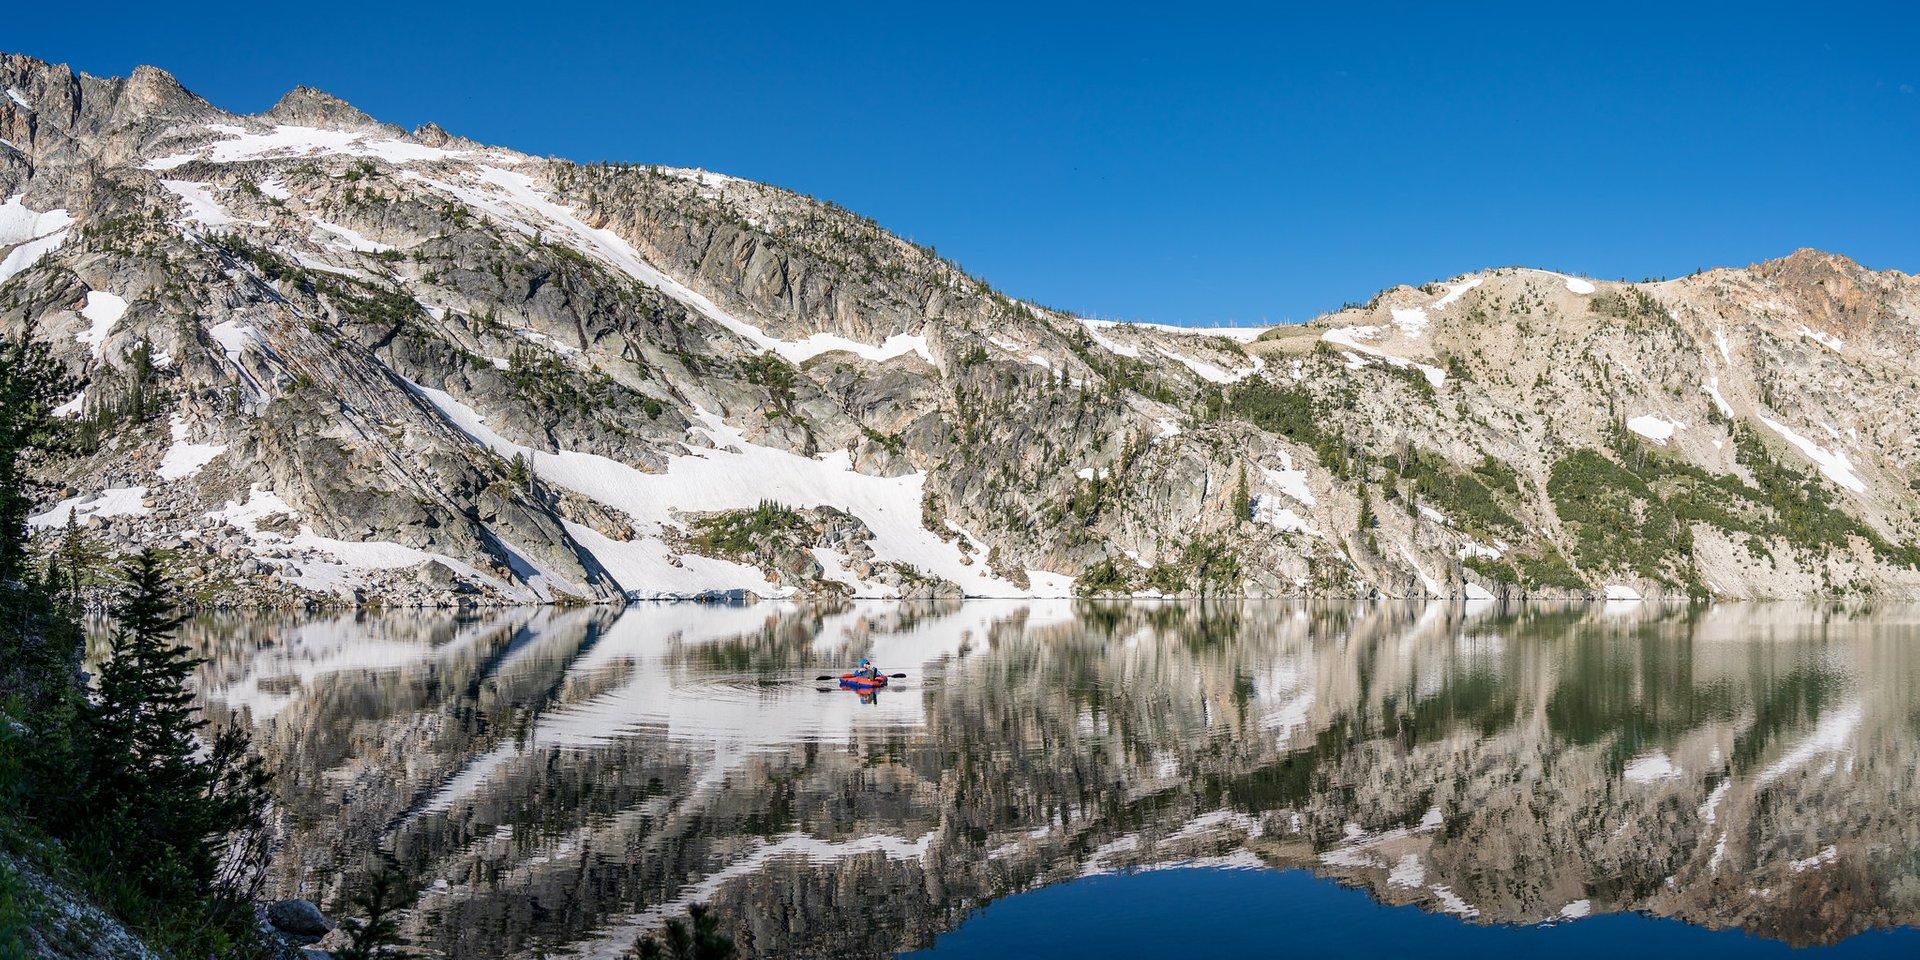 Sawtooth Lake in Idaho 2020 - Best Time